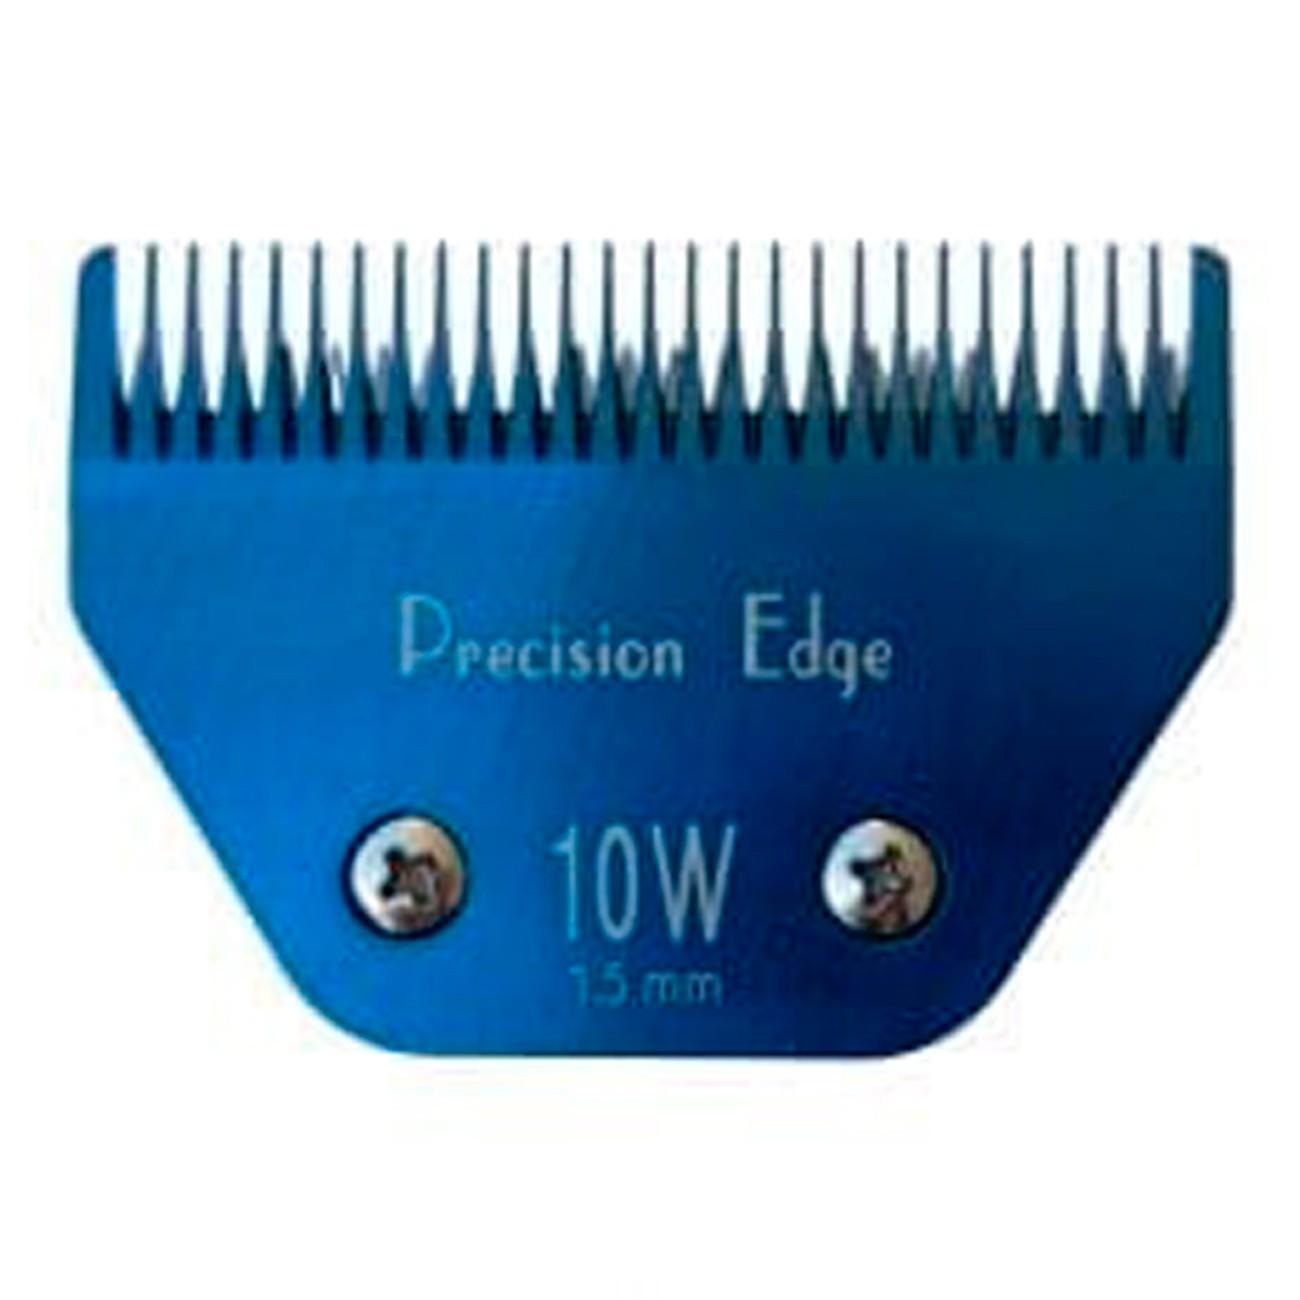 Lâmina Precision Edge 10 Wide Blue - 1,6mm